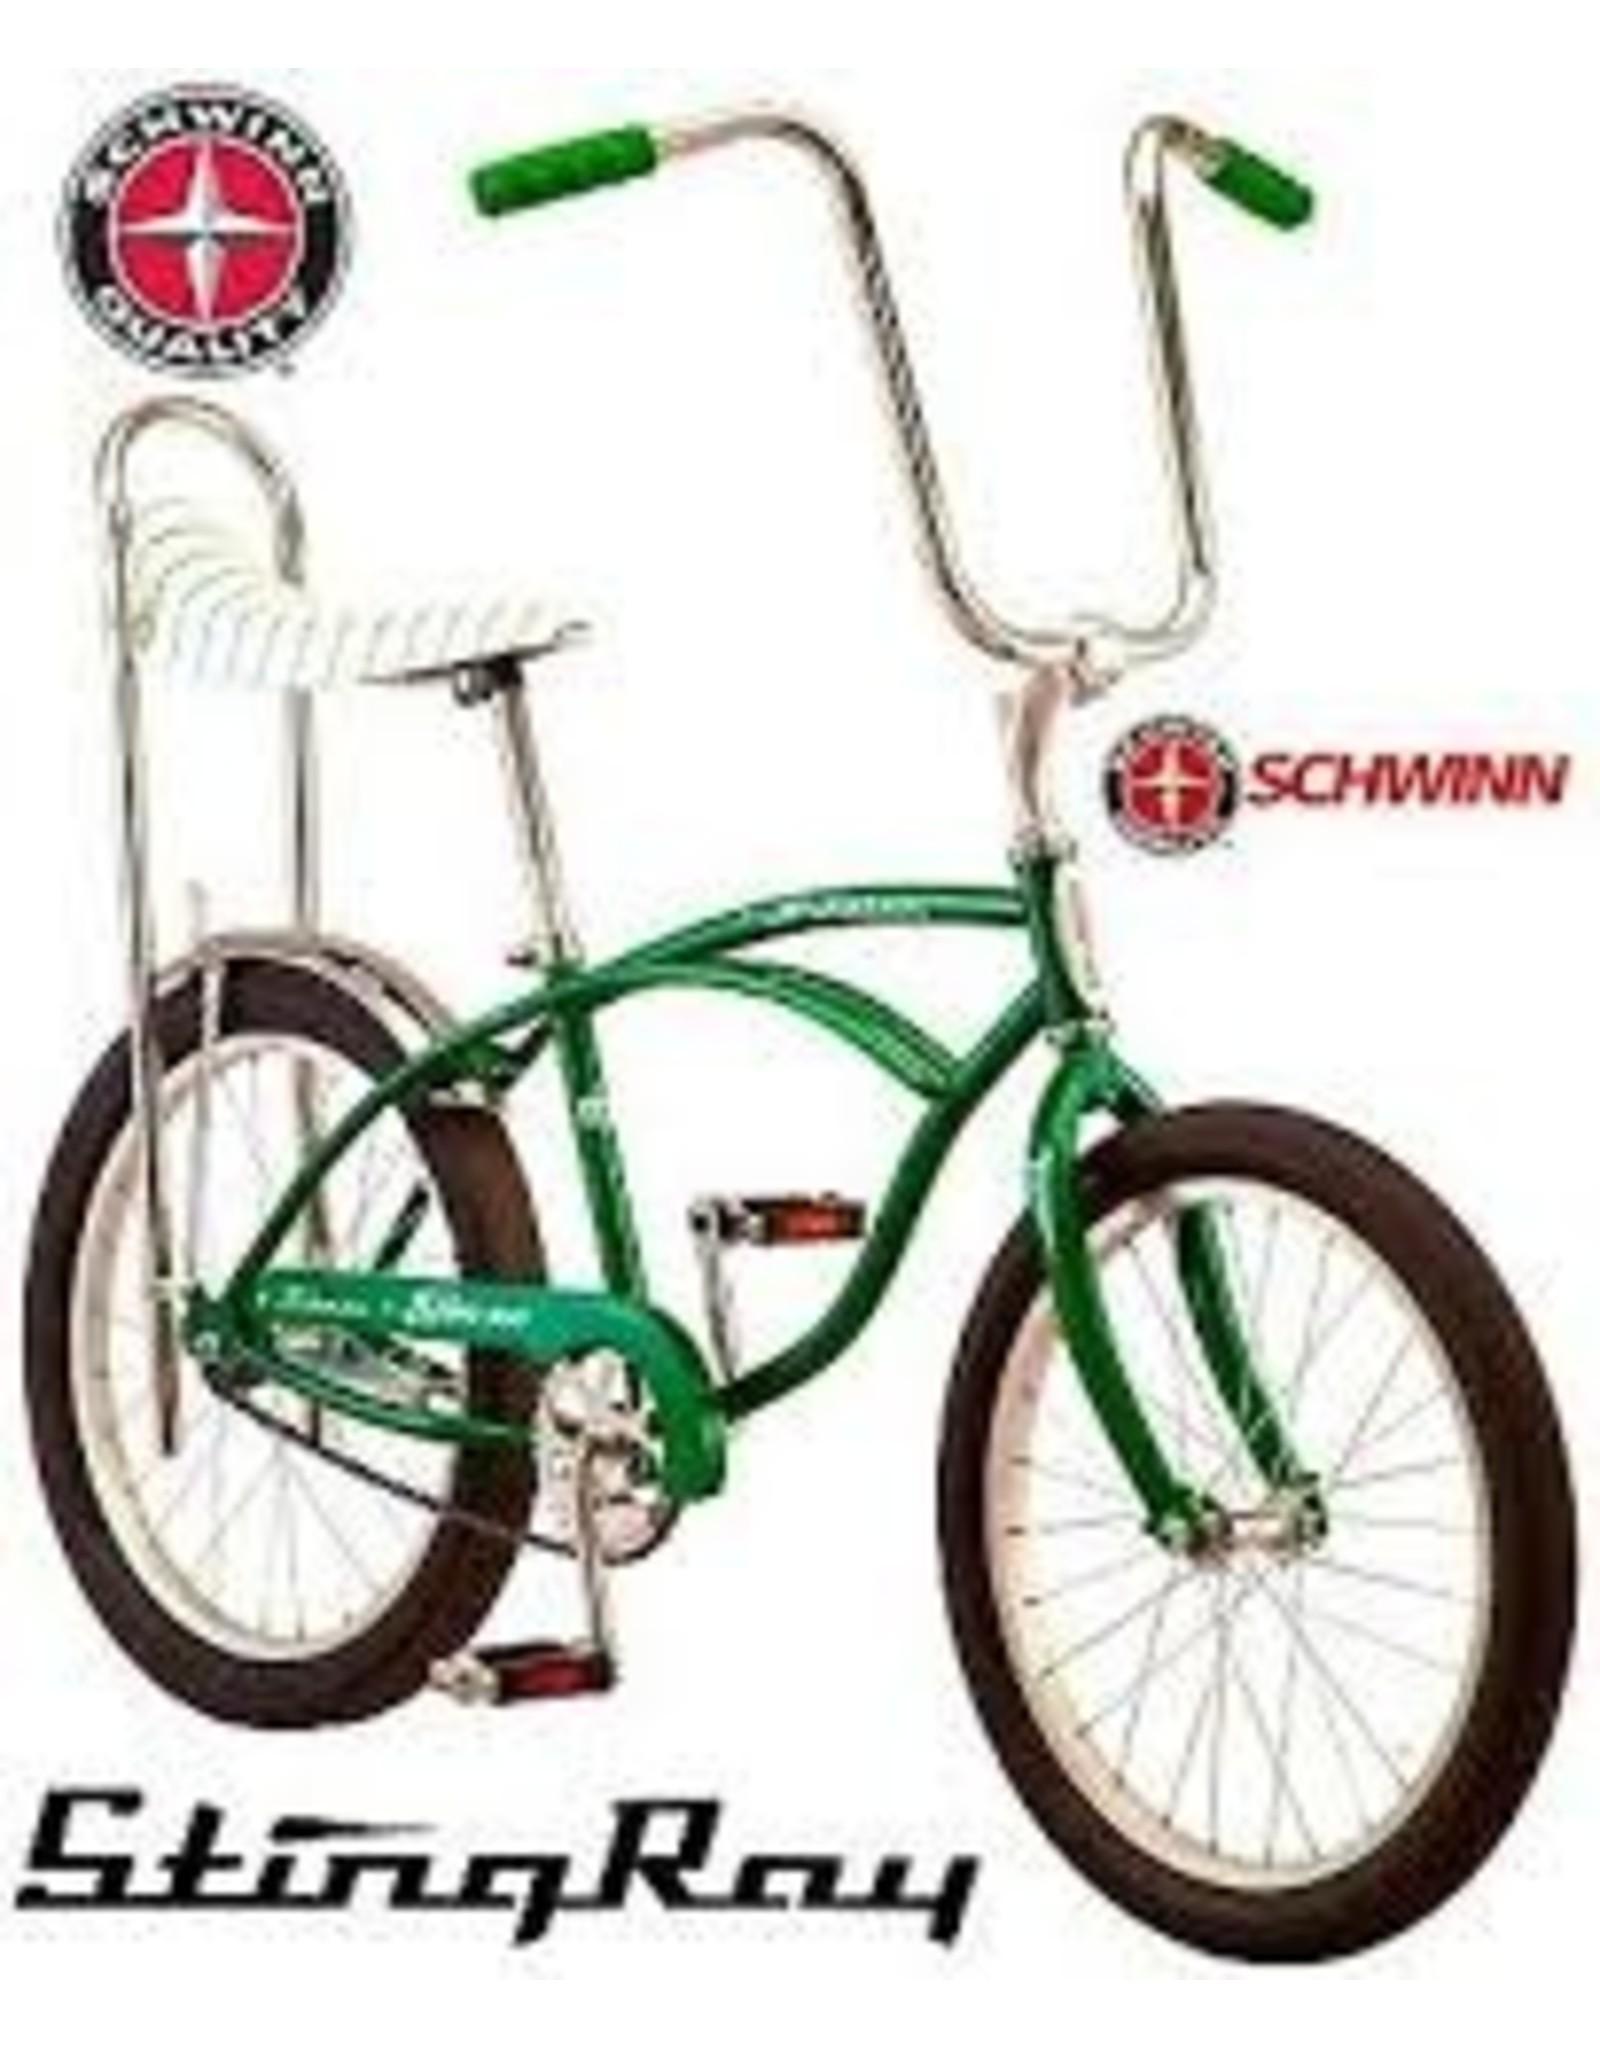 1999 Schwinn Classic stingray